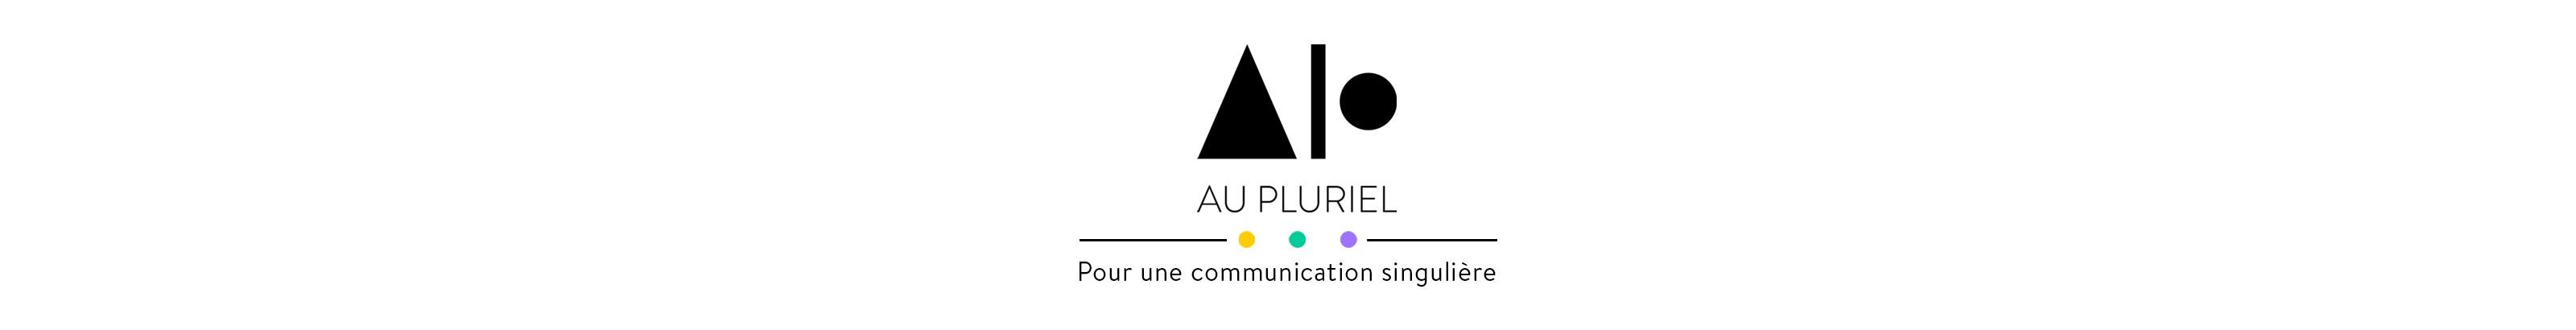 Agence De Communication Roubaix agence au pluriel | linkedin